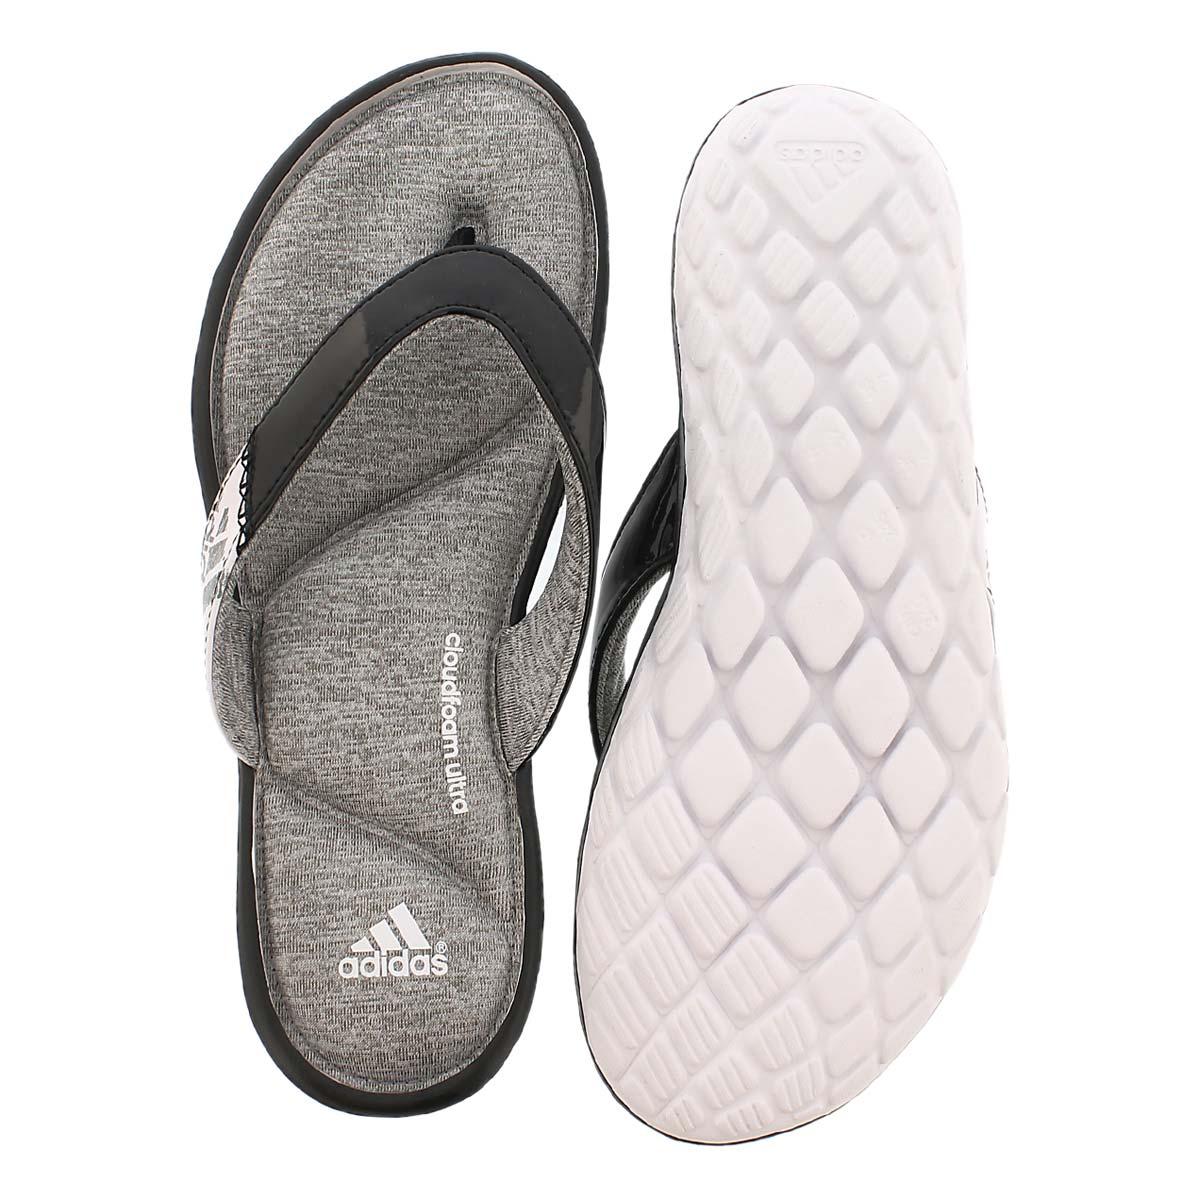 Lds Anyanda Flex Thong blk/wht sandal